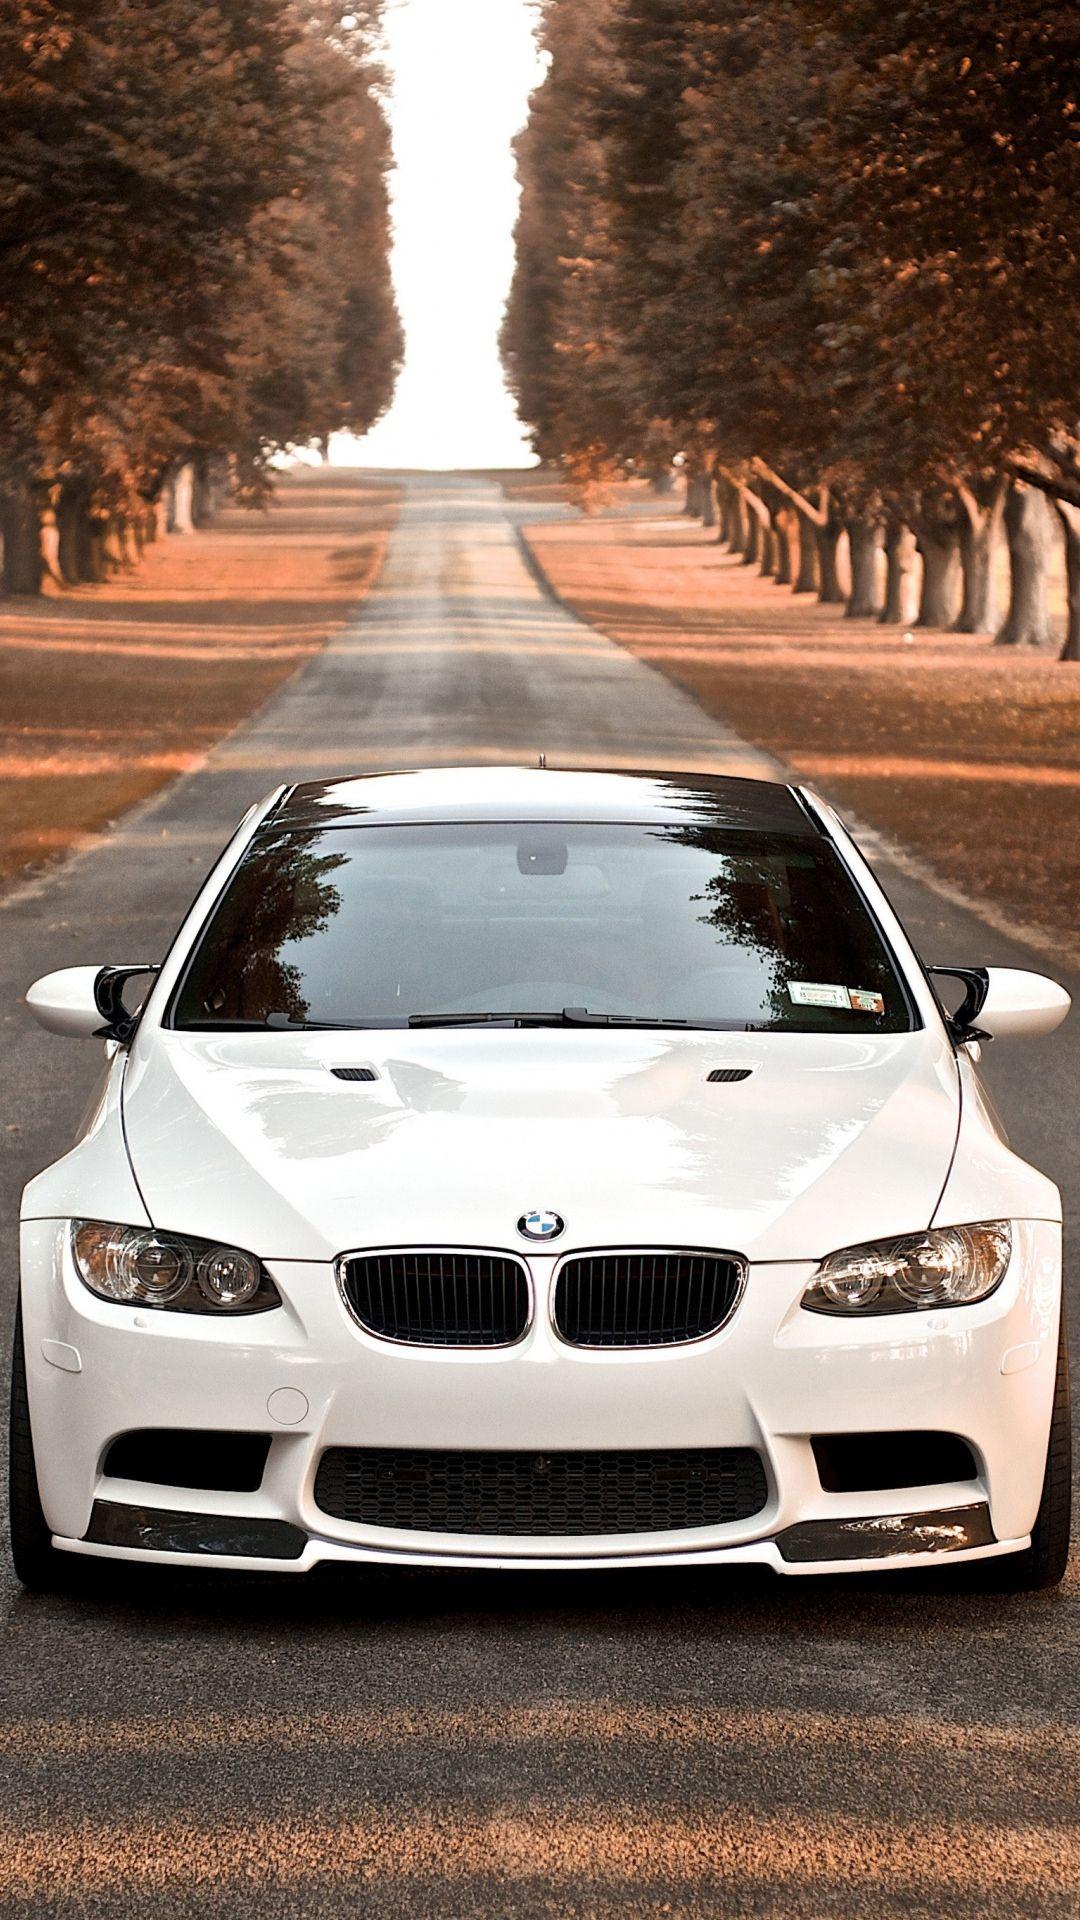 Bmw M3 White Branca Best Htc One Wallpapers Bmw Wallpapers Bmw Iphone Wallpaper Bmw Black